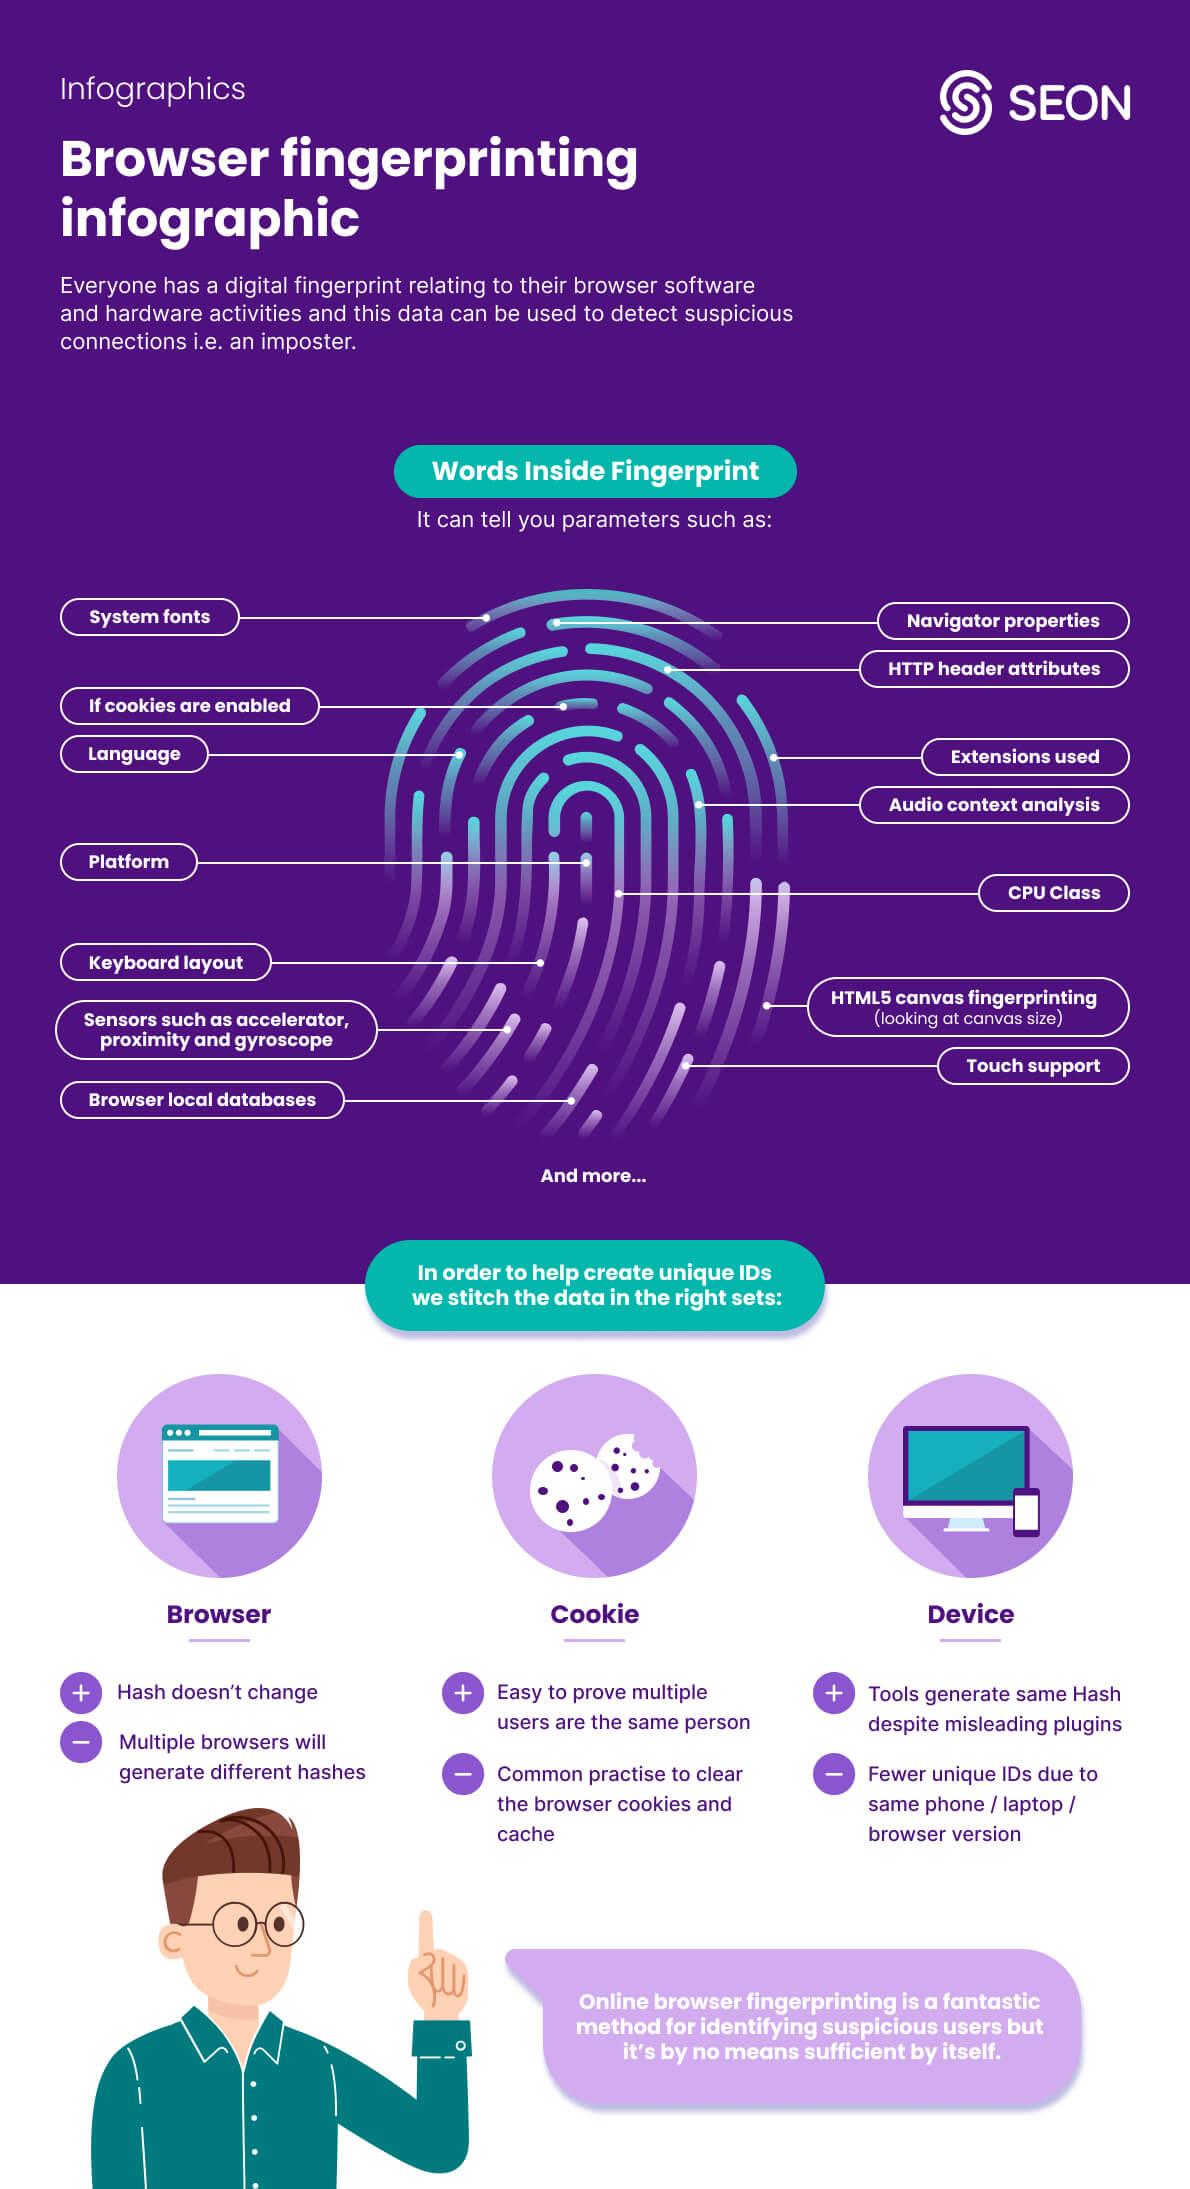 SEON Infographic - Browser Fingerprinting